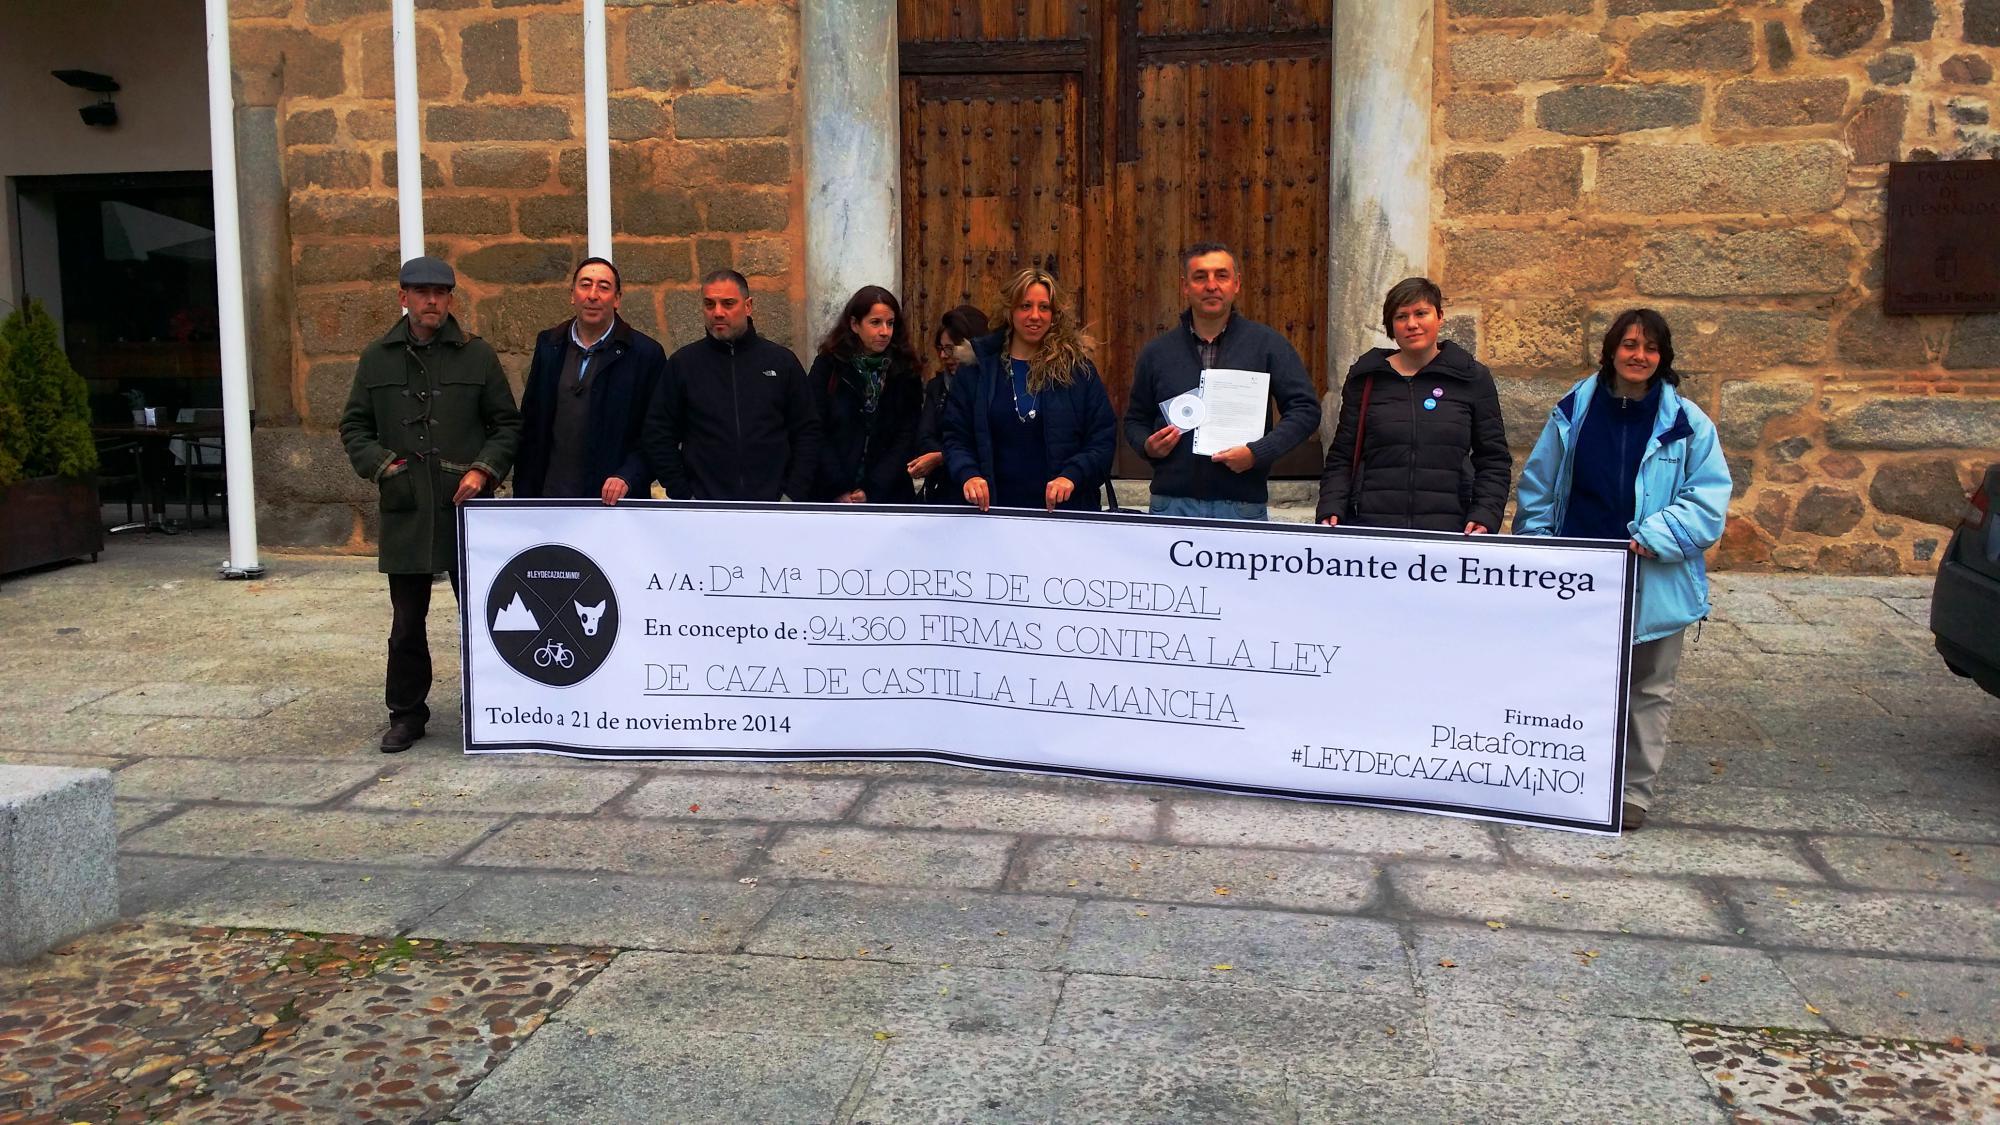 Casi cien mil firmas contra la Ley de Caza de Castilla-La Mancha